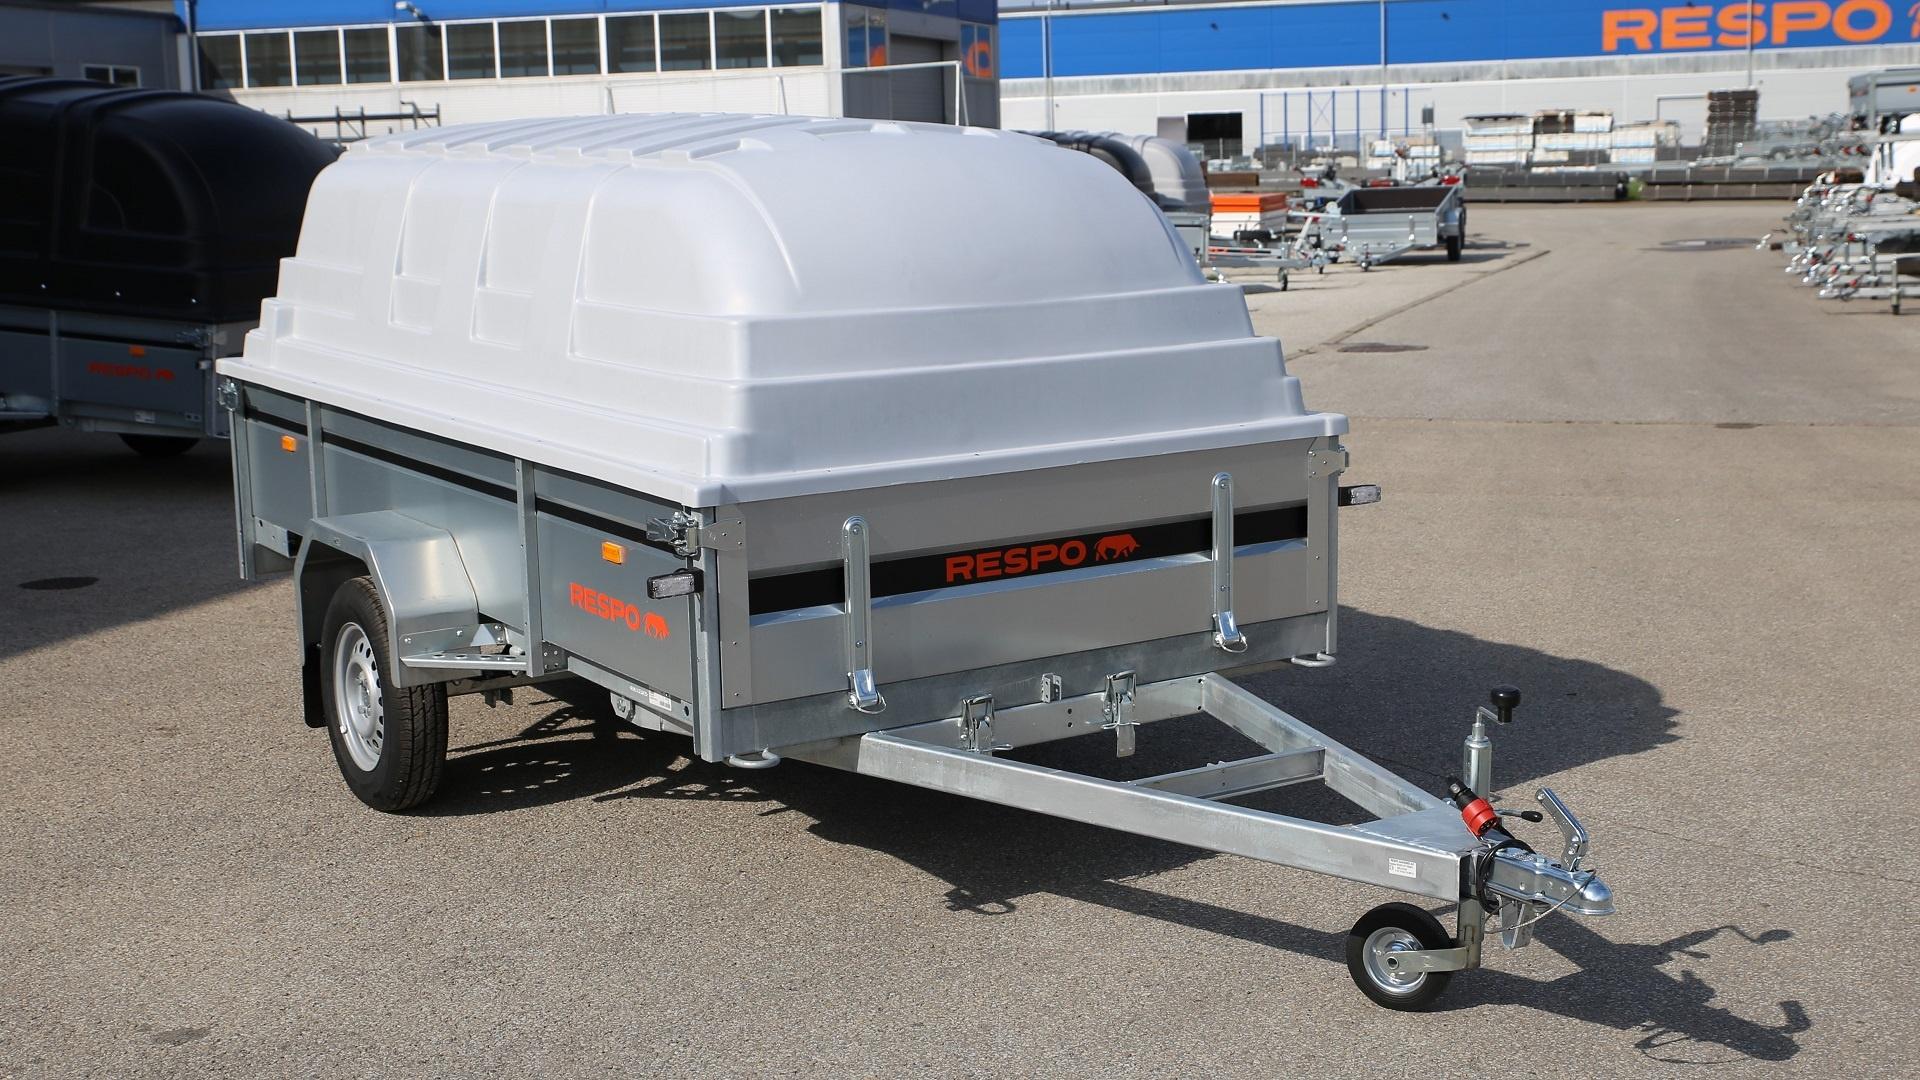 Aerodinaminis dangtis 3,00x1,50x0,7 m. Pagamintas RESPO 750M301L150PLH, 750M301L150, 750M302L150 priekaboms.